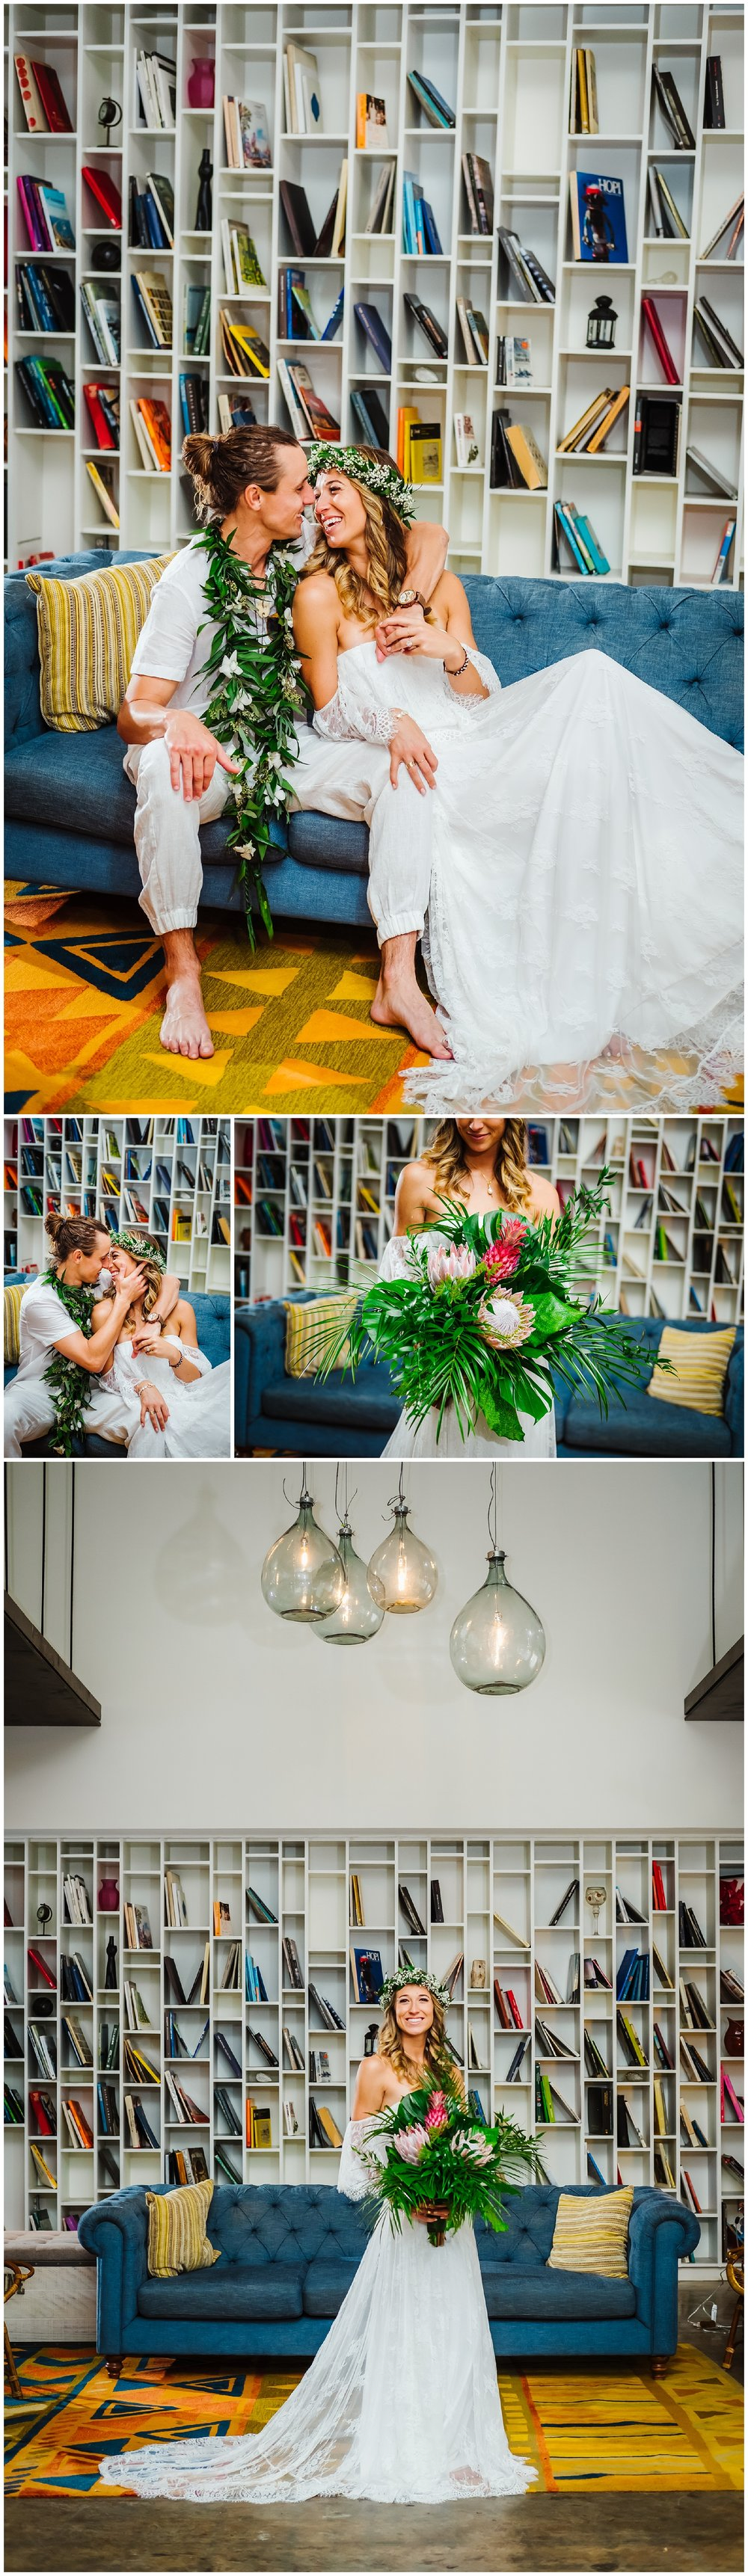 tampa-bay-wedding-photographer-barefoot-post-card-inn-tropical-hawaiin-lei-pink-pineapples-flower-crown_0147.jpg